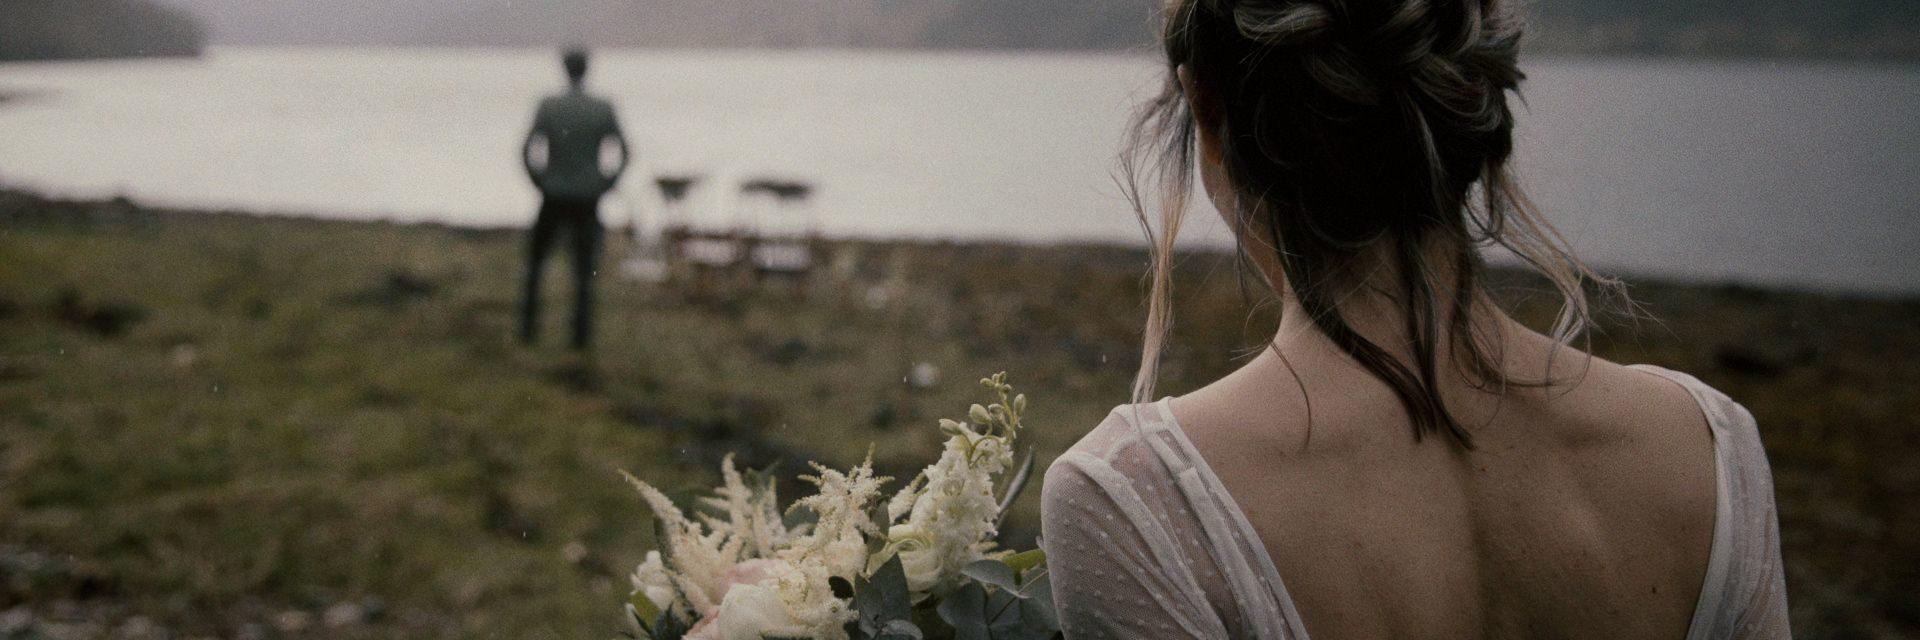 Lucca-wedding-videographer-cinemate-films-02